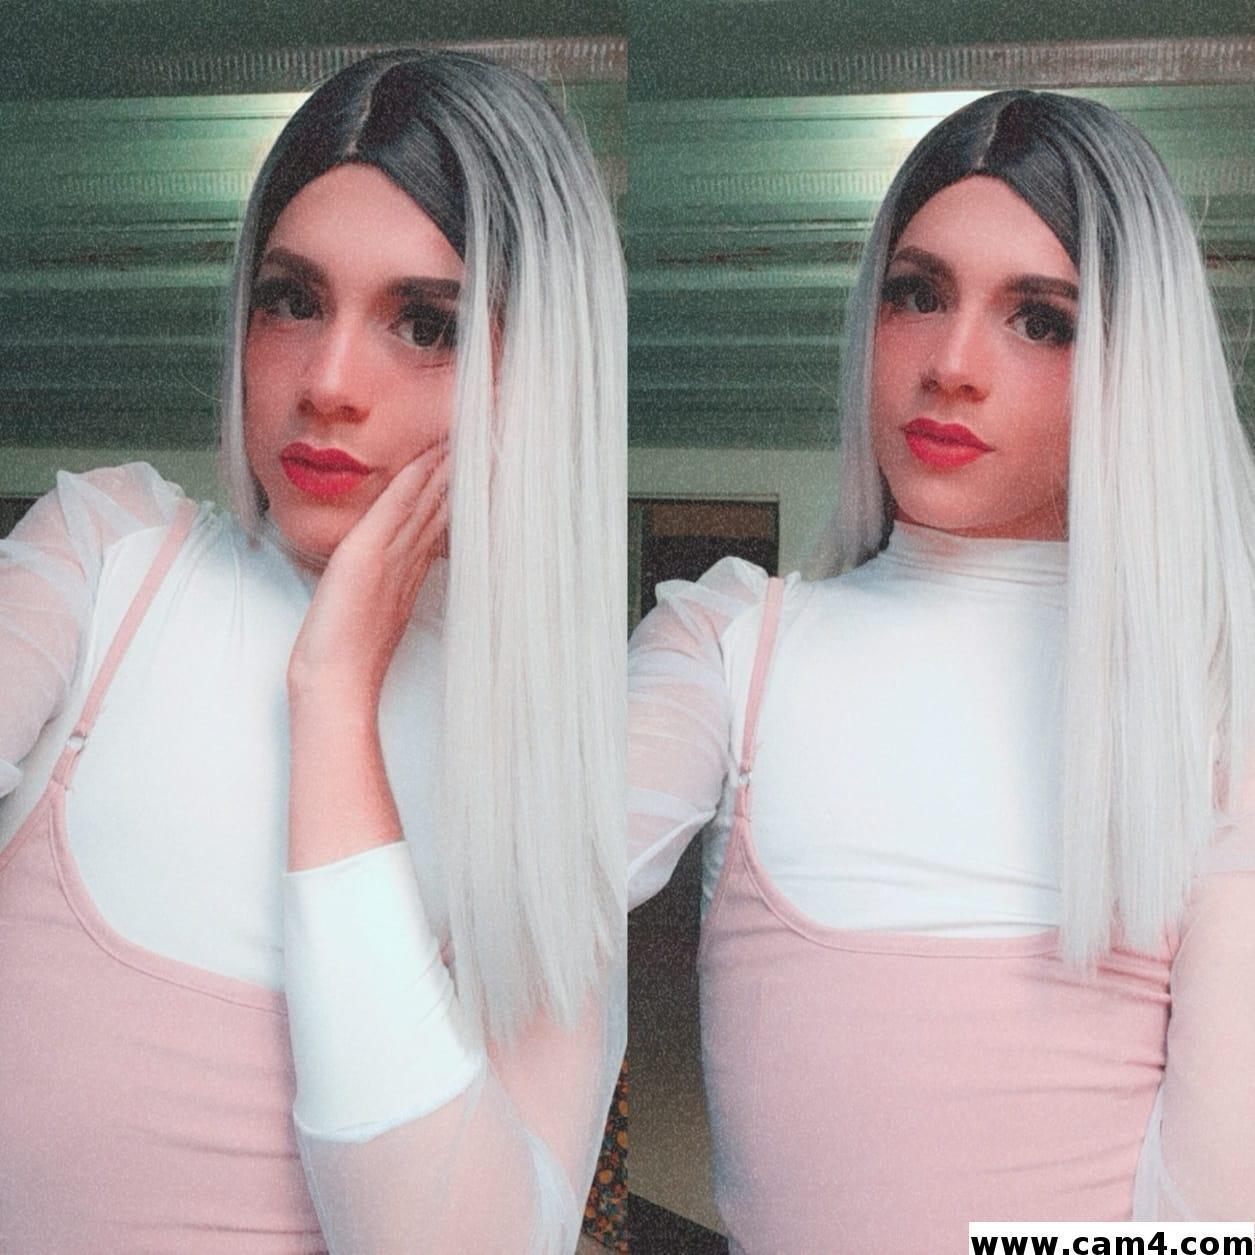 Arianna queen?s=253gr1w9vmd5pkqeutfrjlolfgx+kaq86pklzrsgoqc=